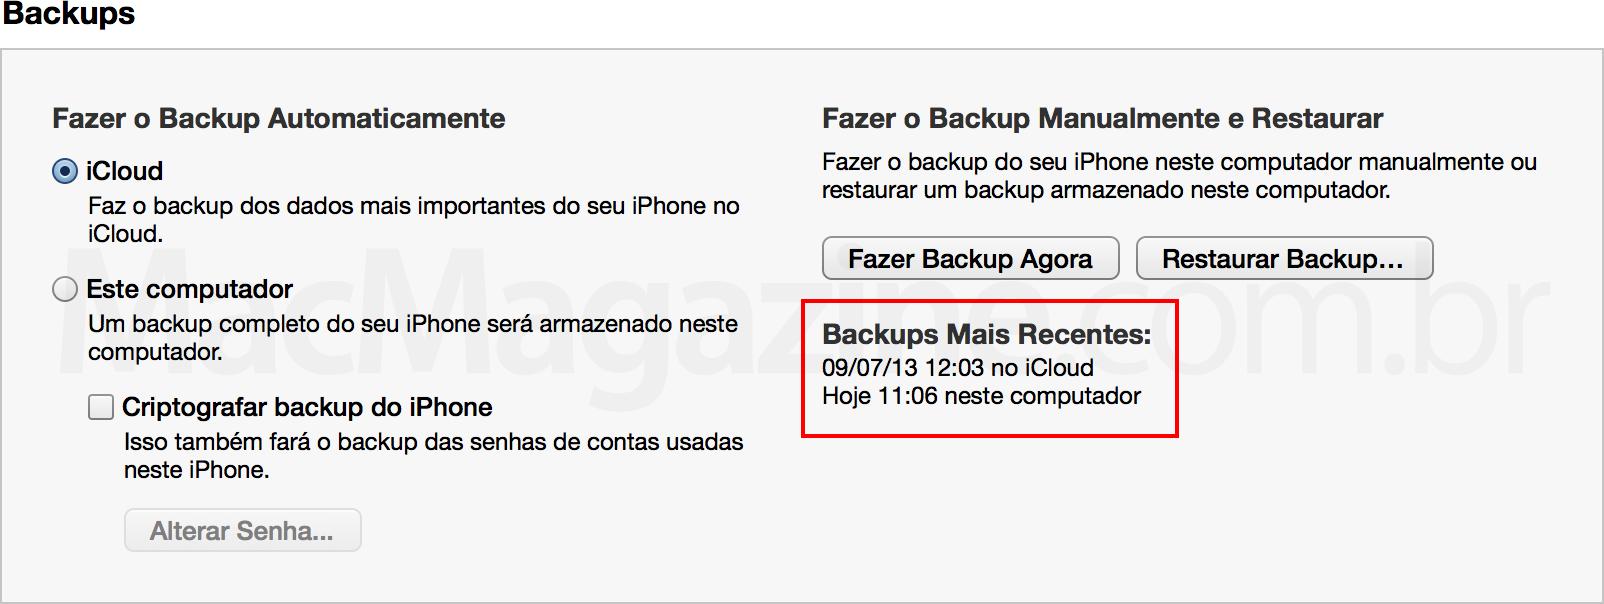 Backup de iGadgets